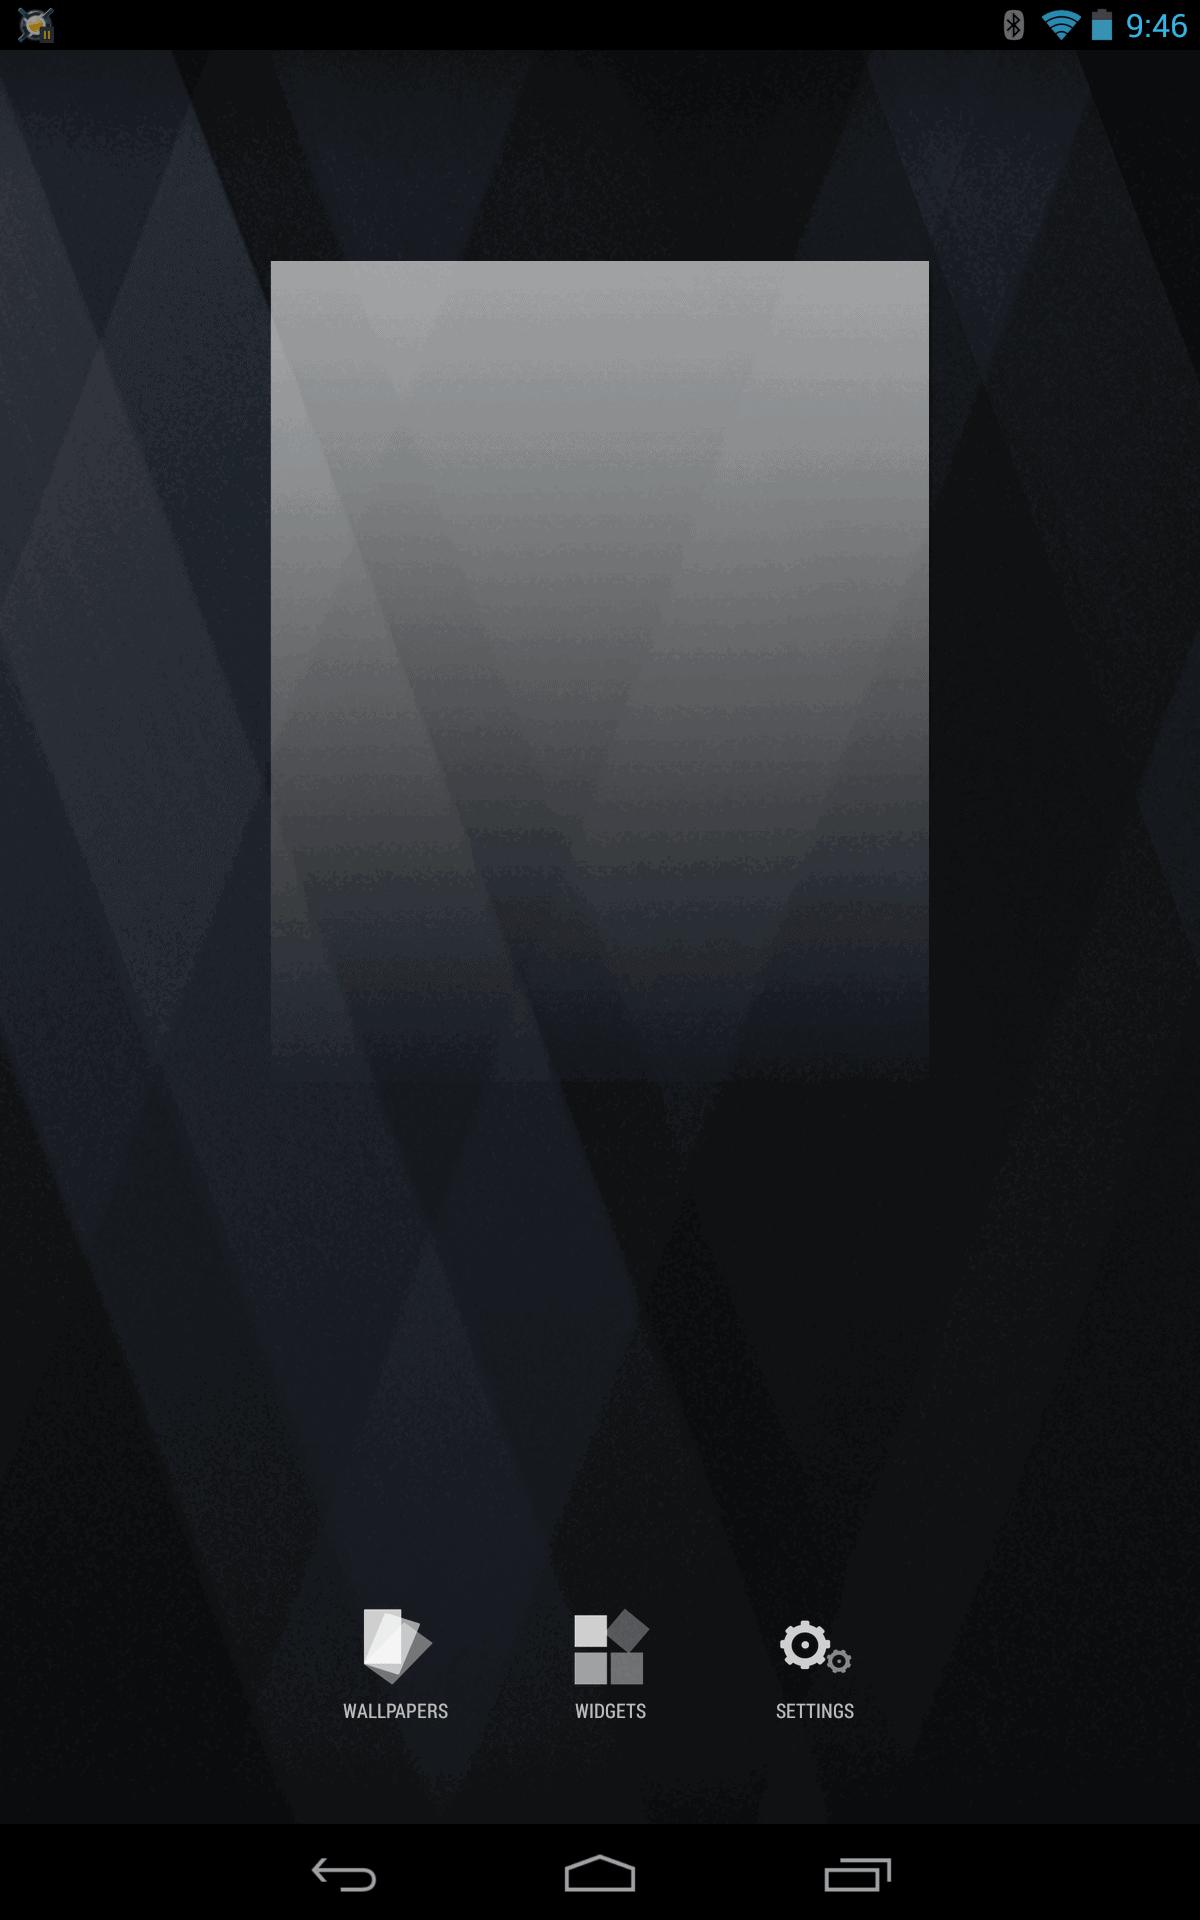 Screenshot 2013 10 31 21 46 47